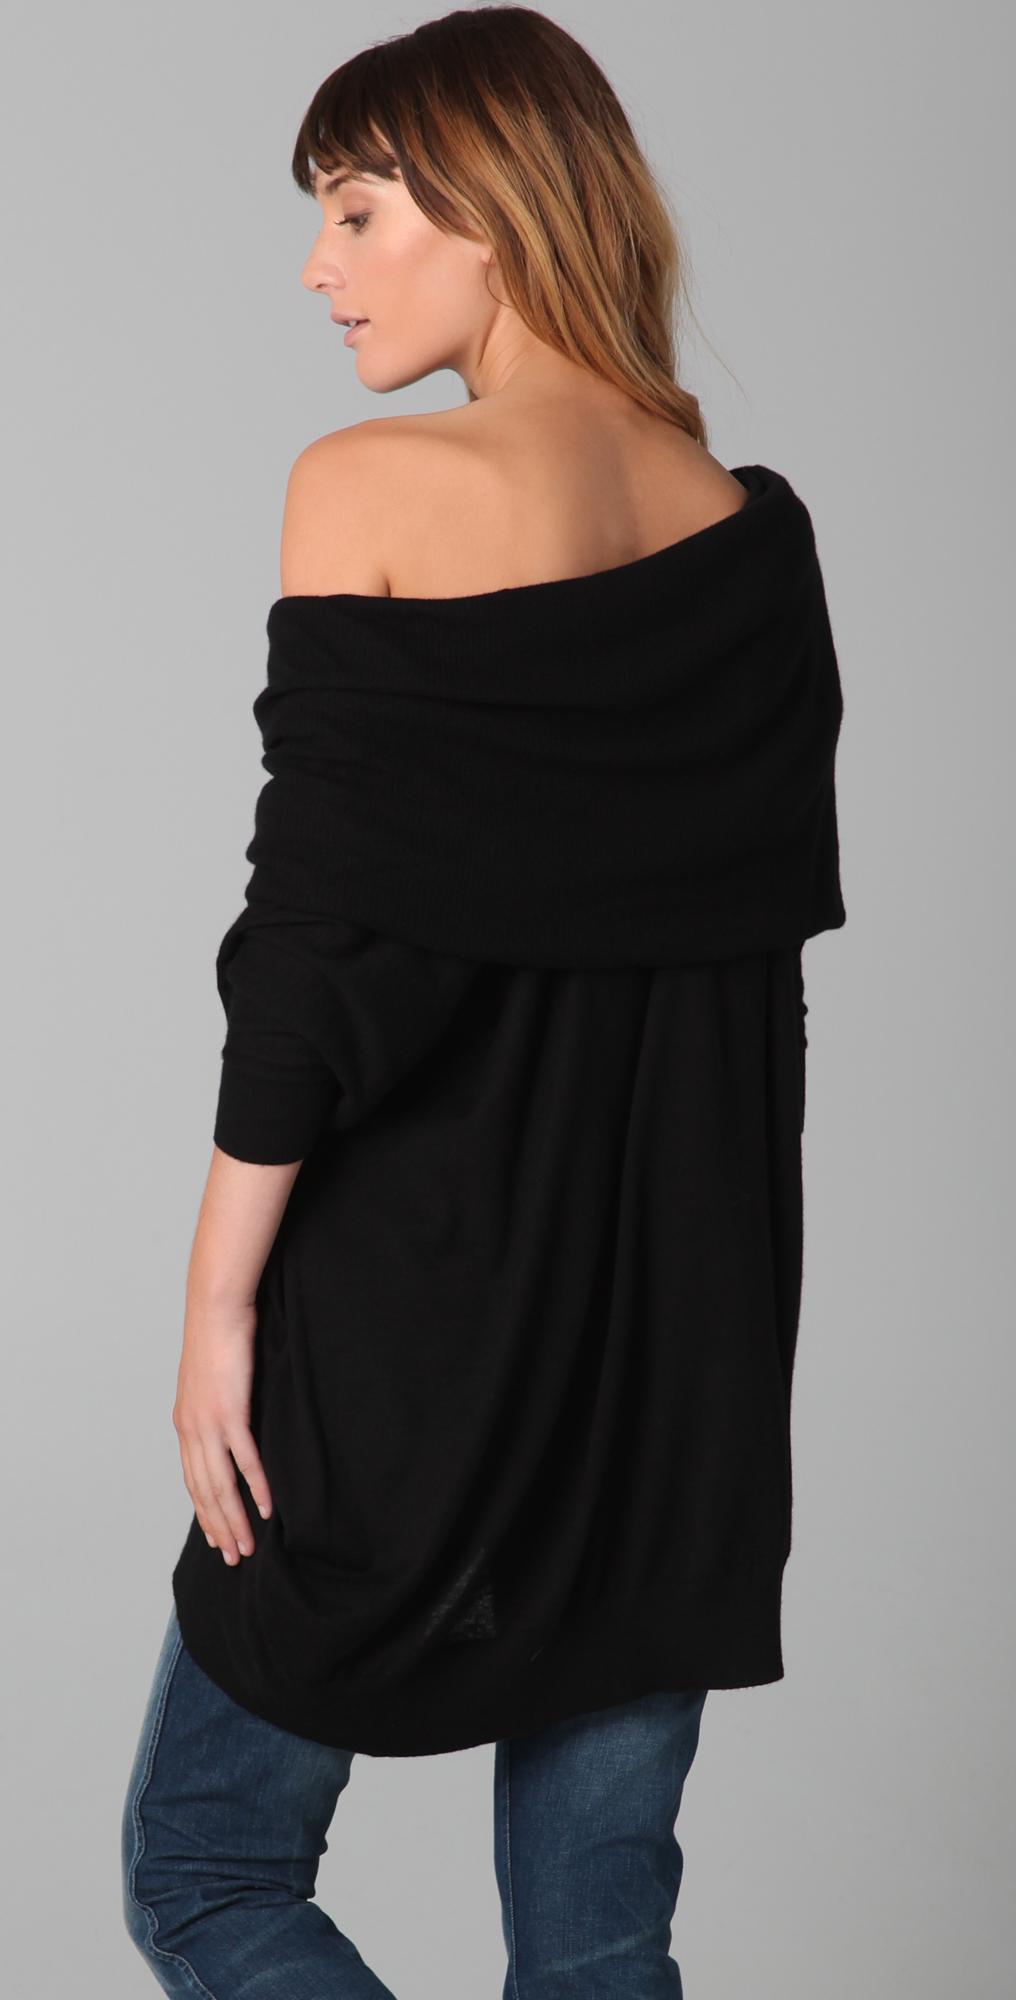 d3bc8e20bb5 Bop Basics Oversized Cashmere Cowl Neck Sweater